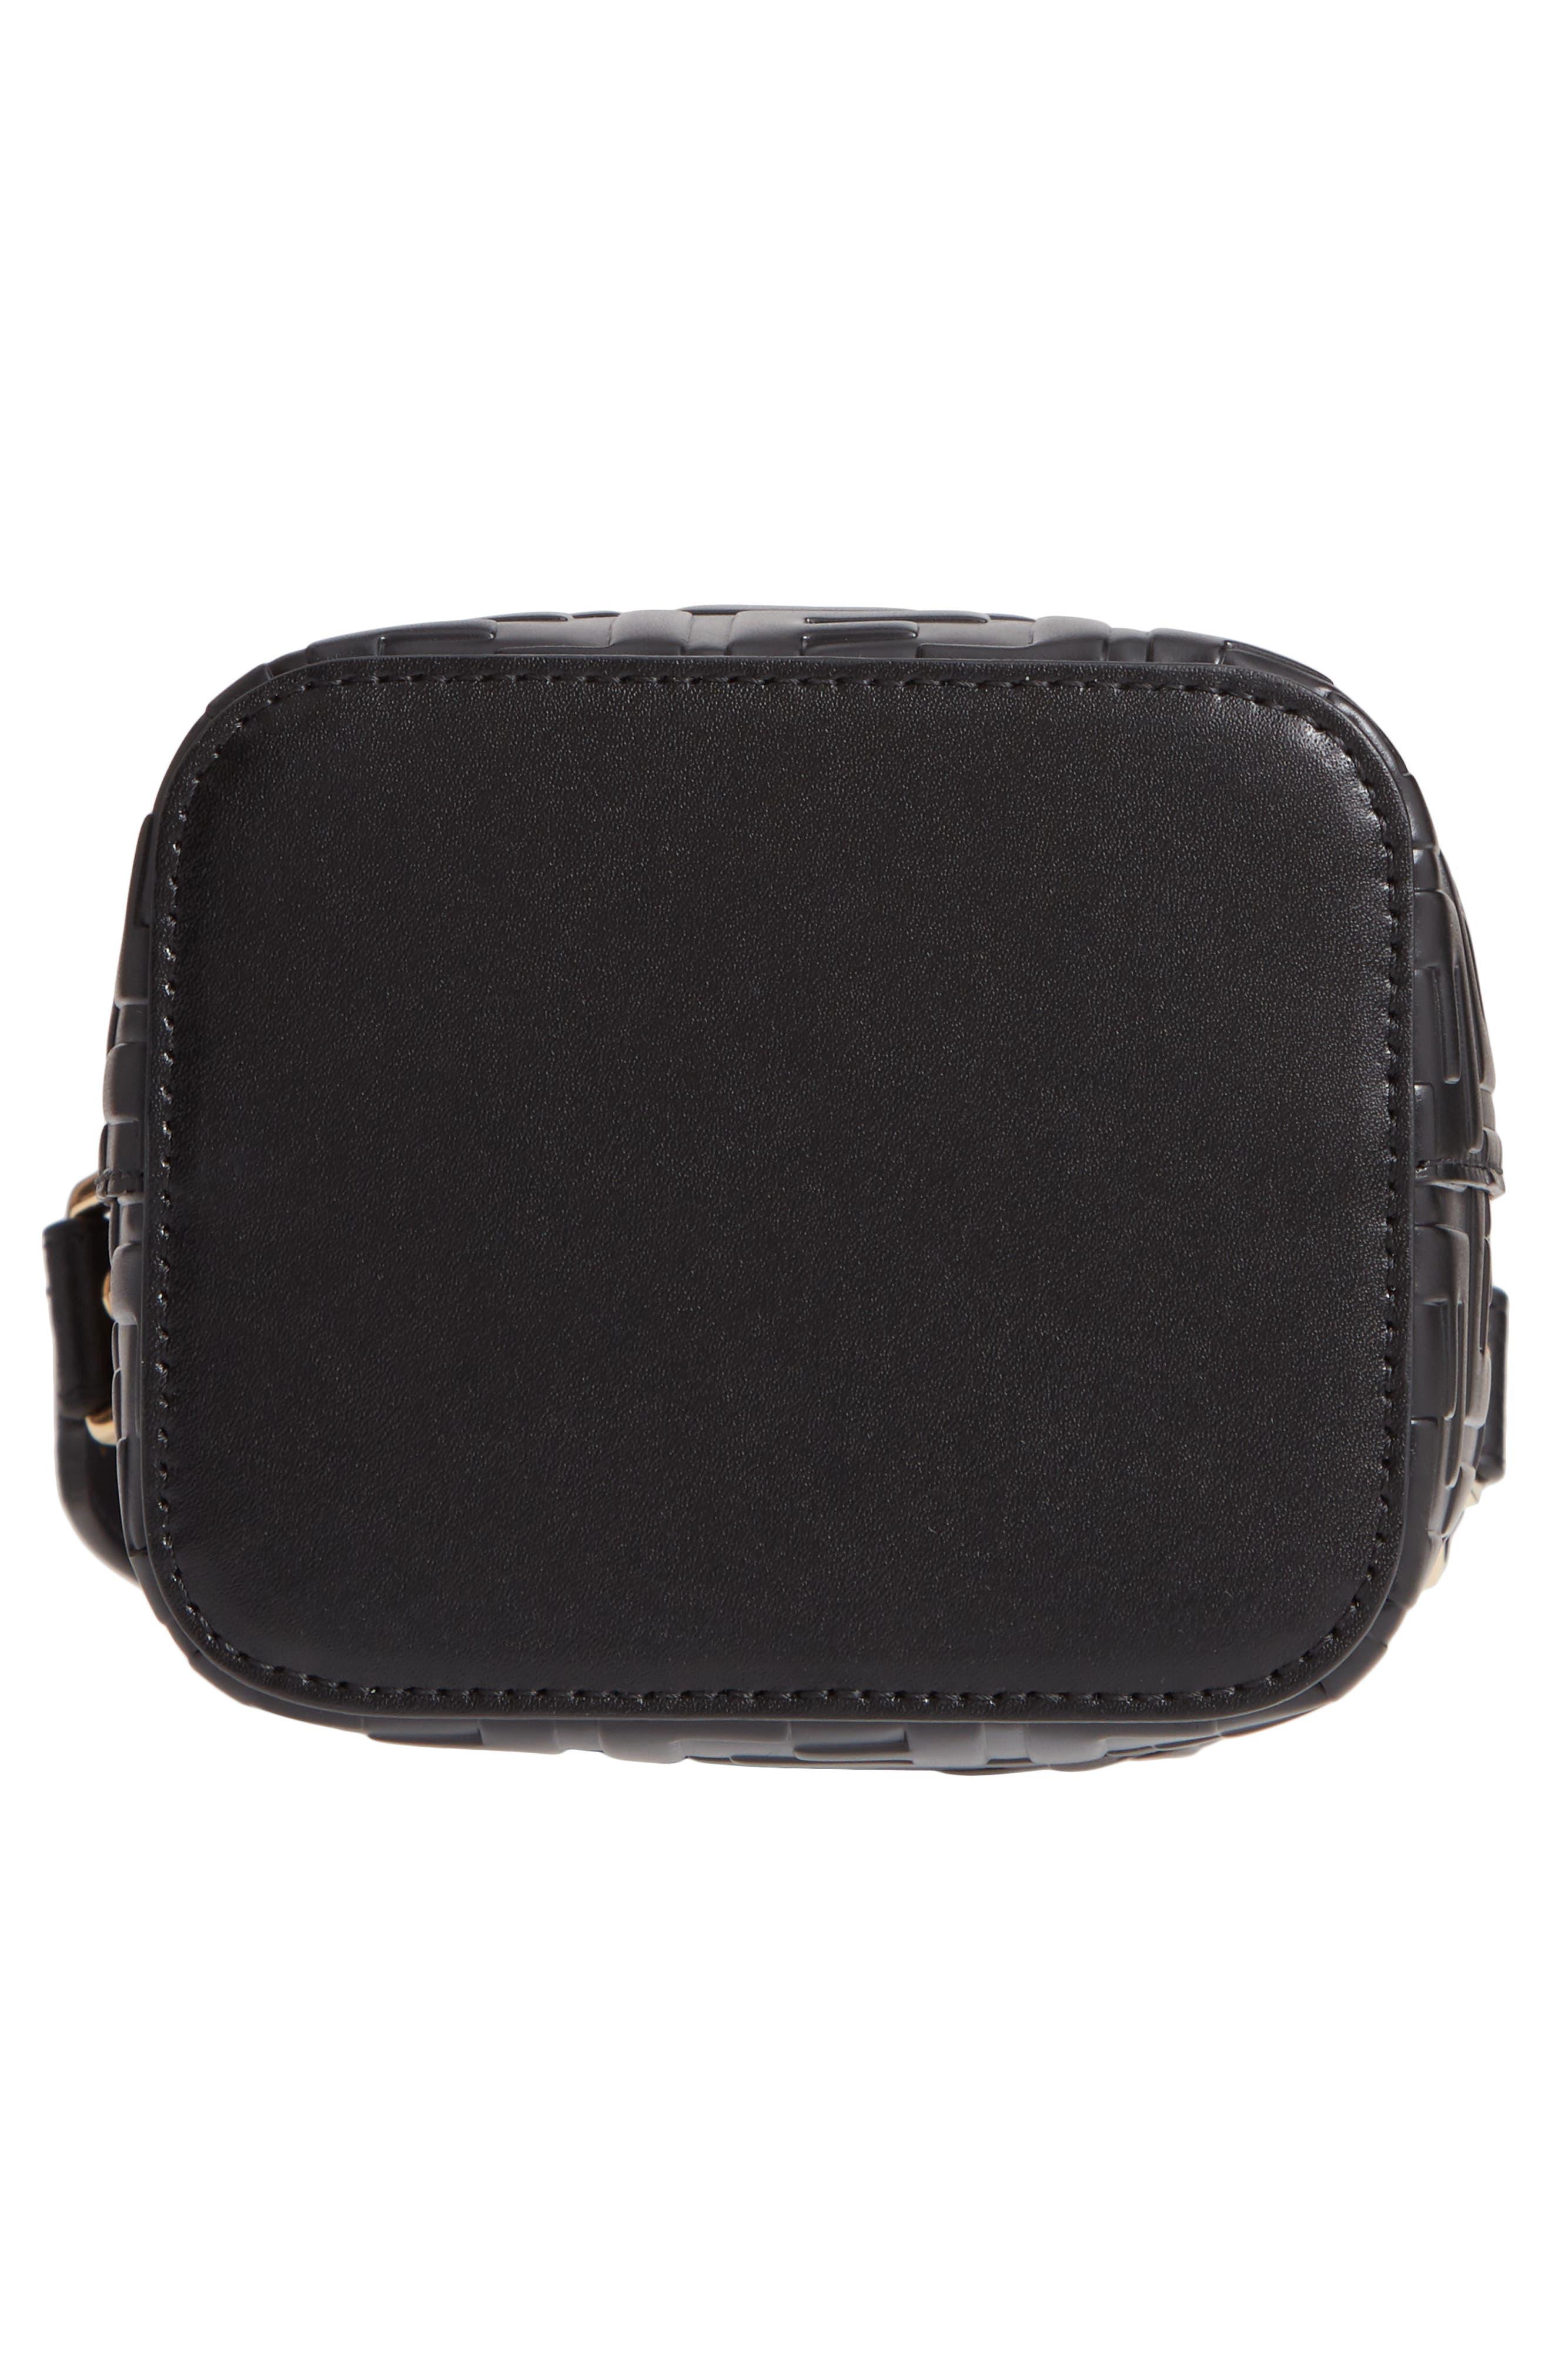 FENDI, Mini Mon Tresor Logo Leather Bucket Bag, Alternate thumbnail 7, color, NERO/ ORO SOFT